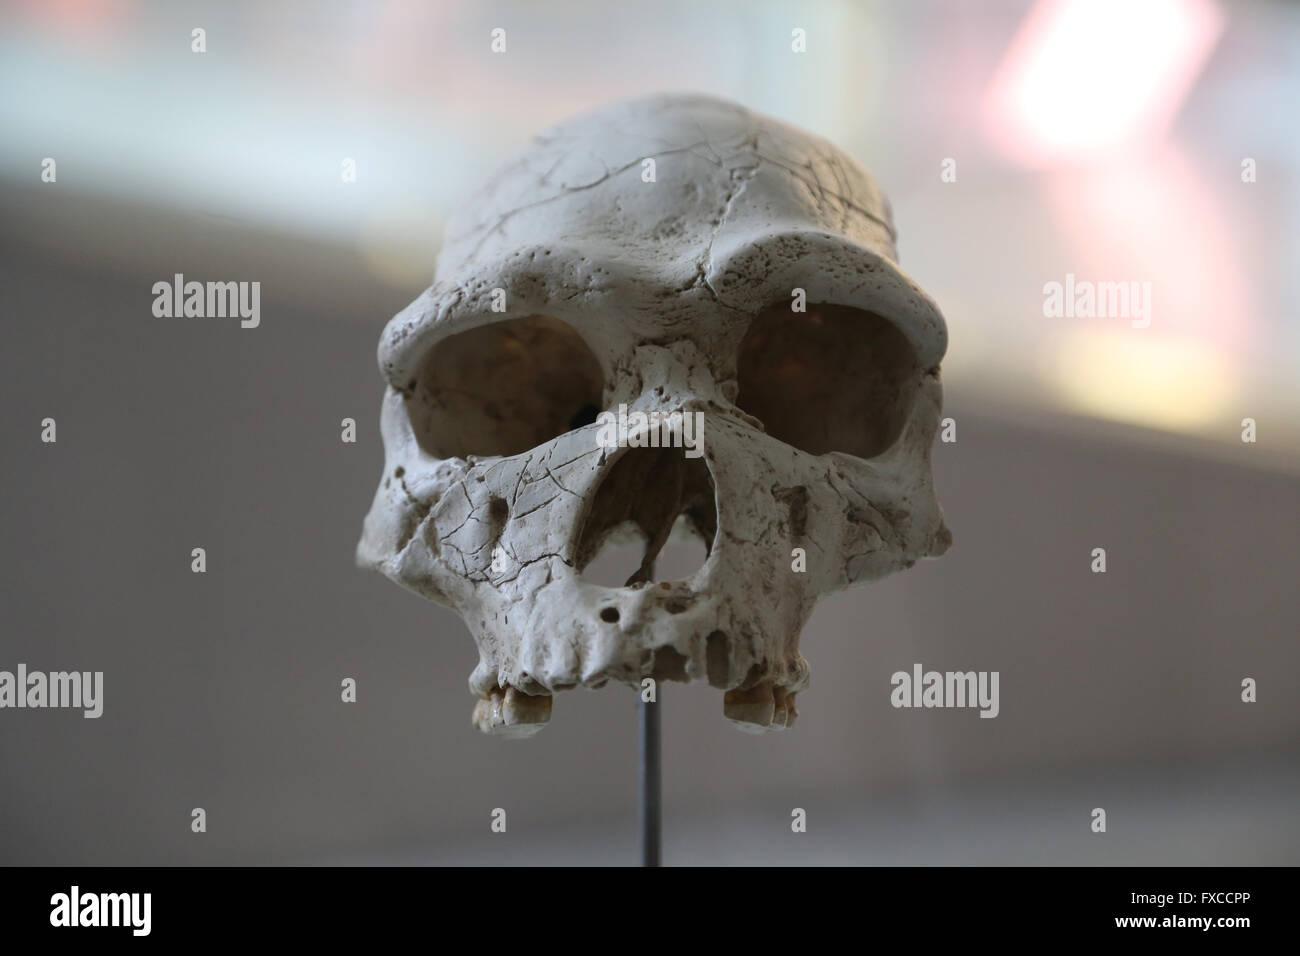 Homo Heidelbergensis. Europe. -600.000-160.000. Mediu Pleistocene. Brain size: 1100-1400 cm3. Mode 2 (Acheulean). - Stock Image